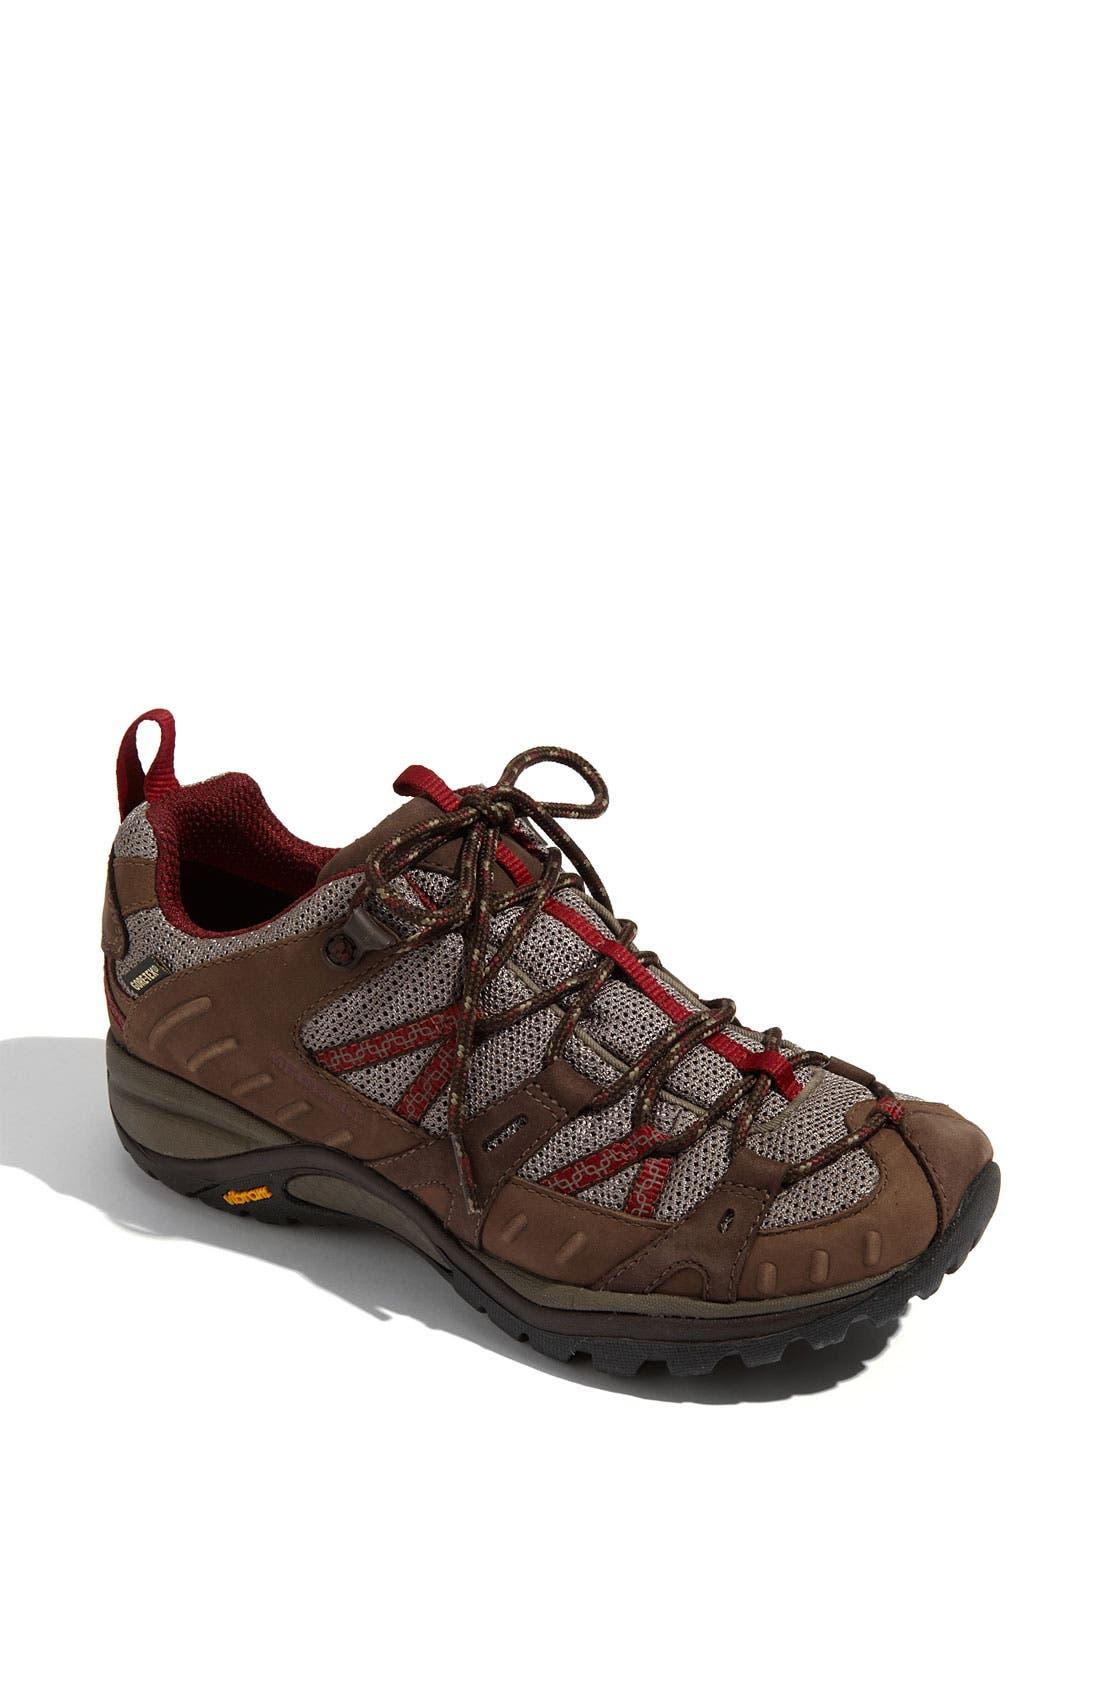 Alternate Image 1 Selected - Merrell 'Siren Sport Gore-Tex® XCR' Hiking Shoe (Women)